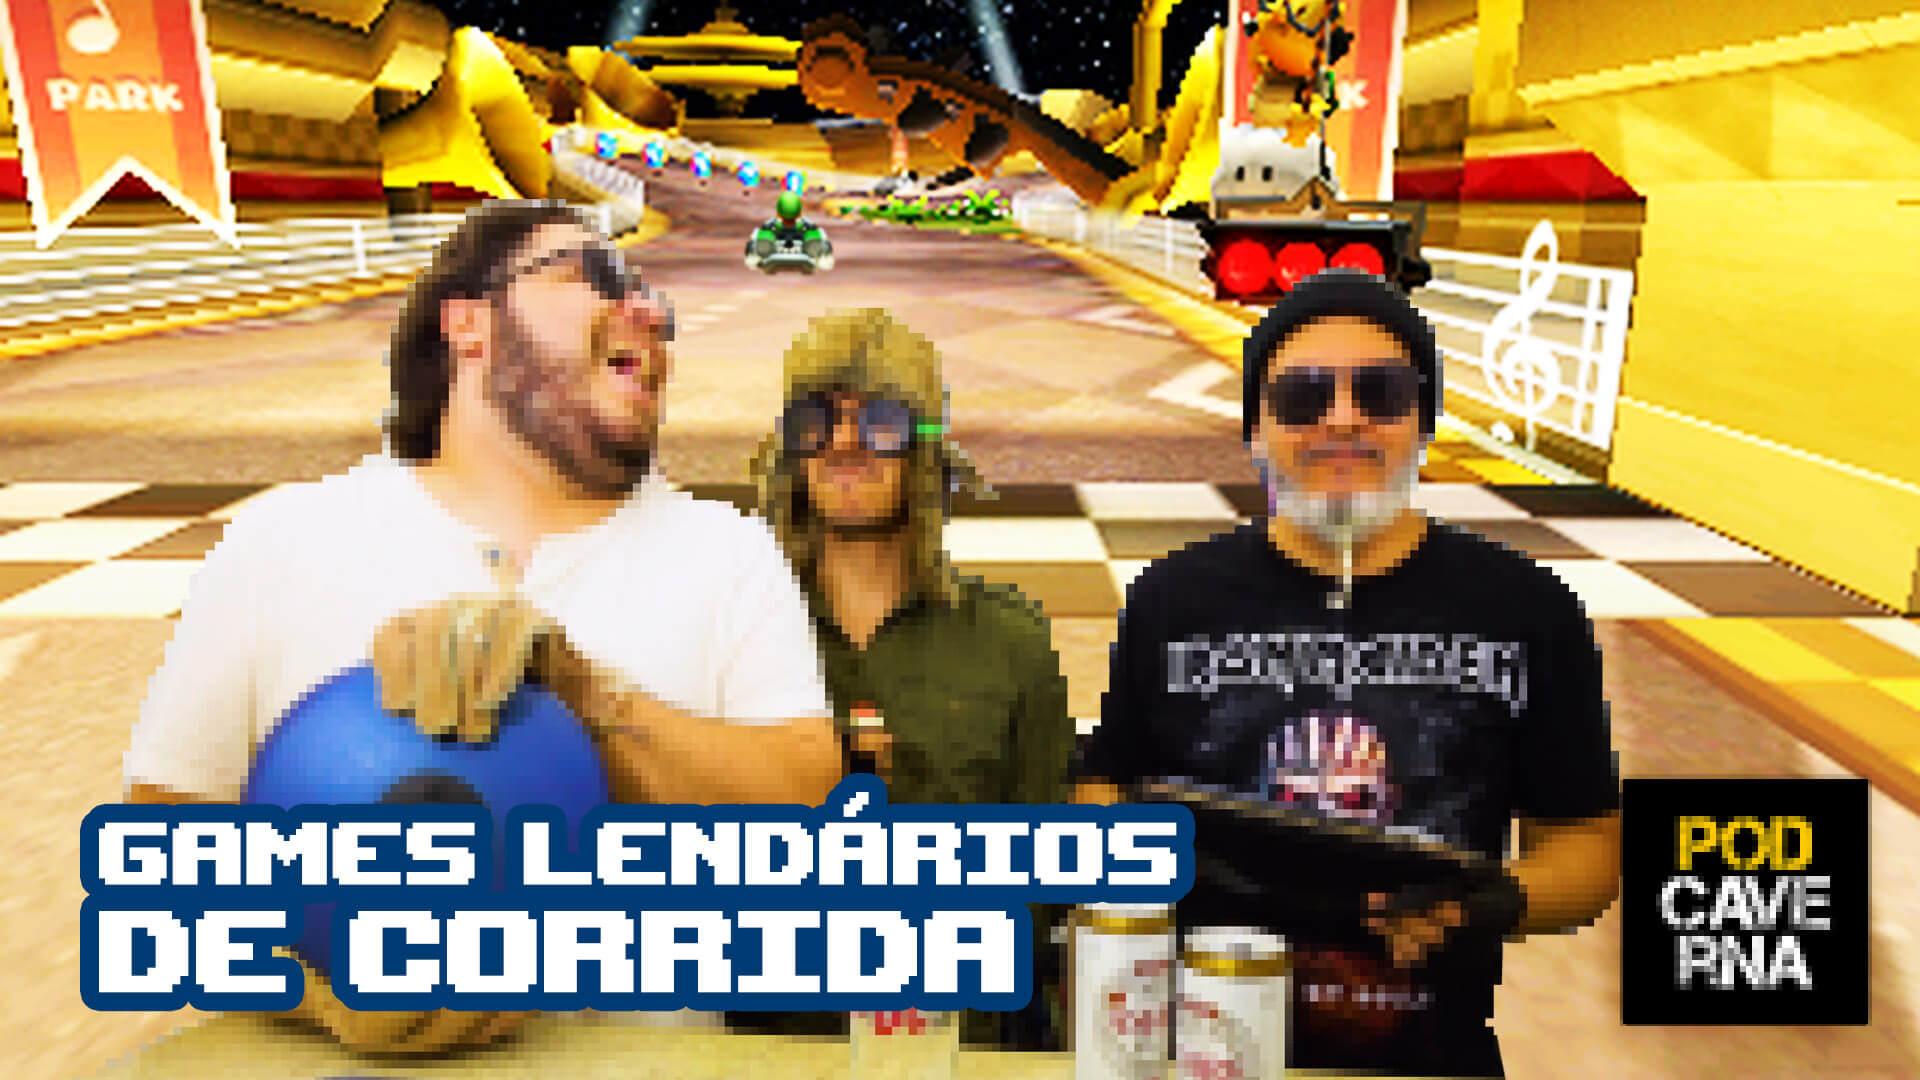 Games Lendários de Corrida